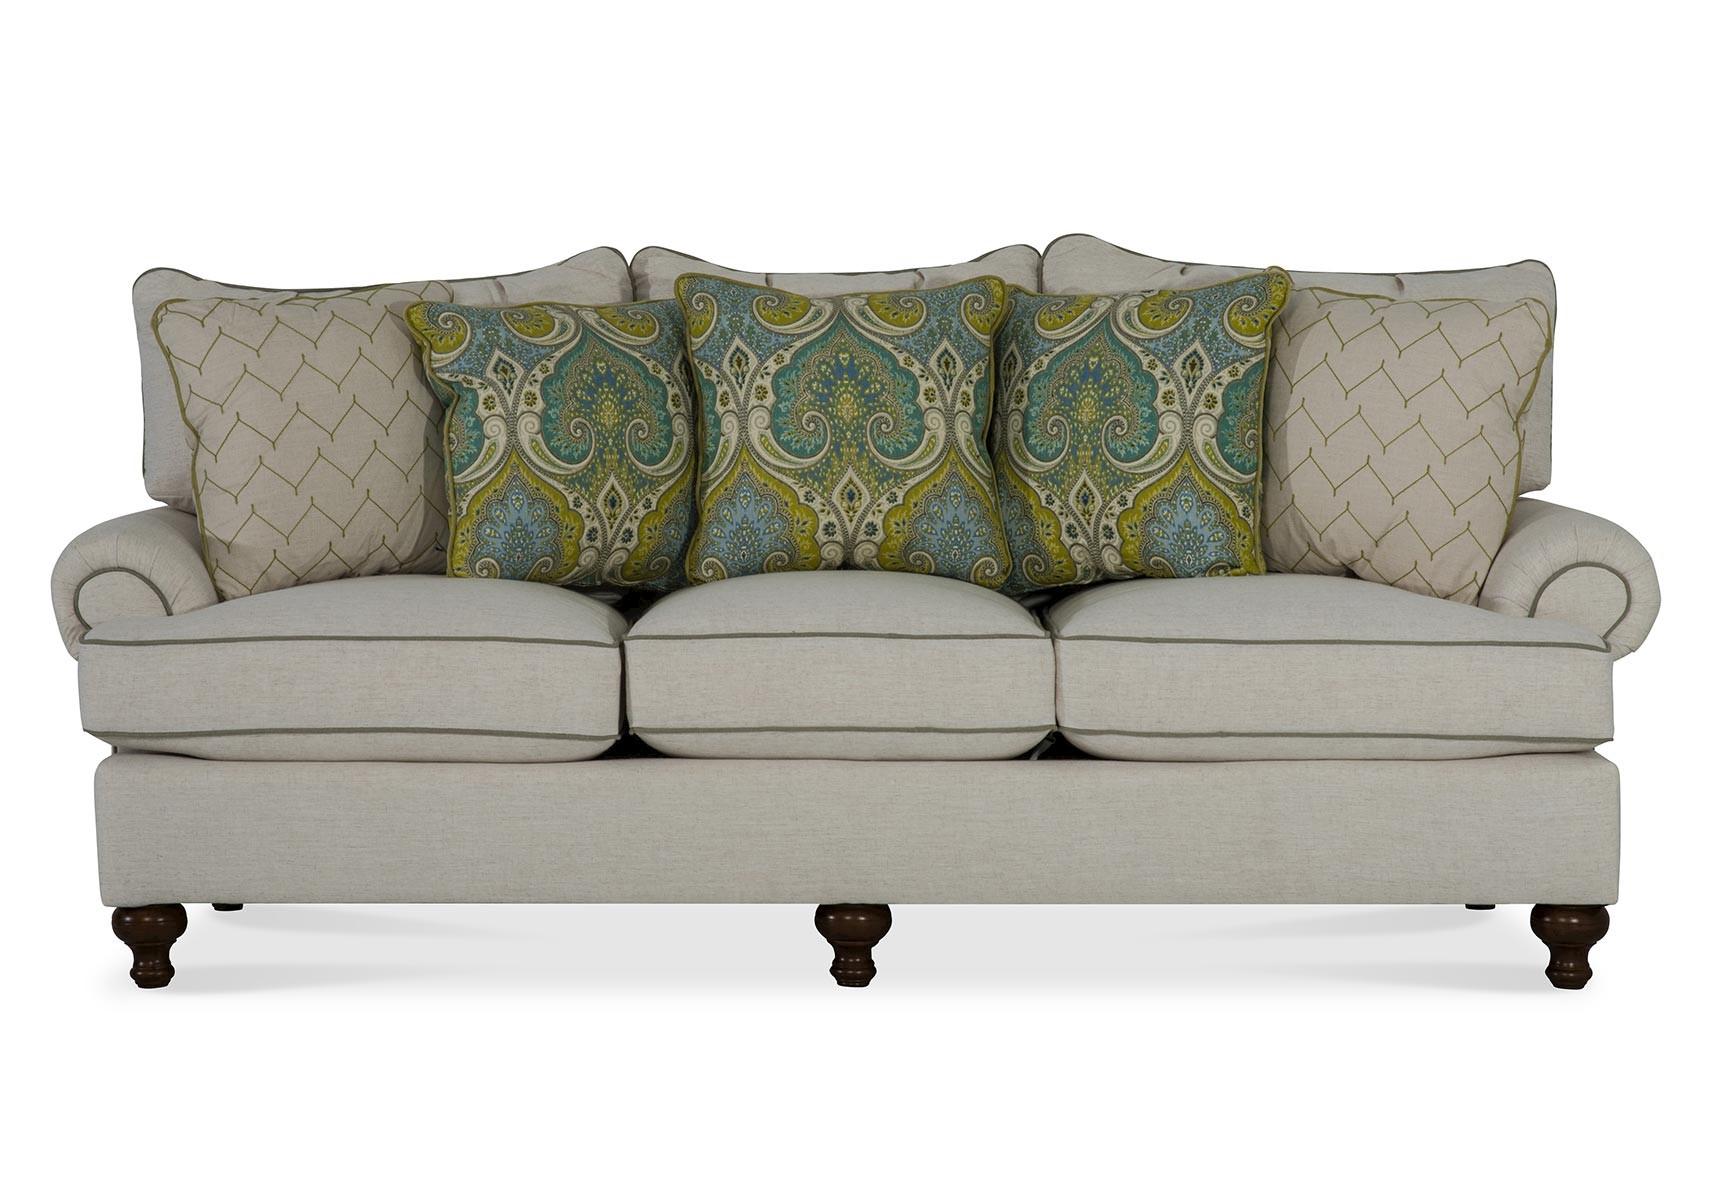 southern furniture gibson sofa iron set online bangalore paula deen sofas | www.gradschoolfairs.com